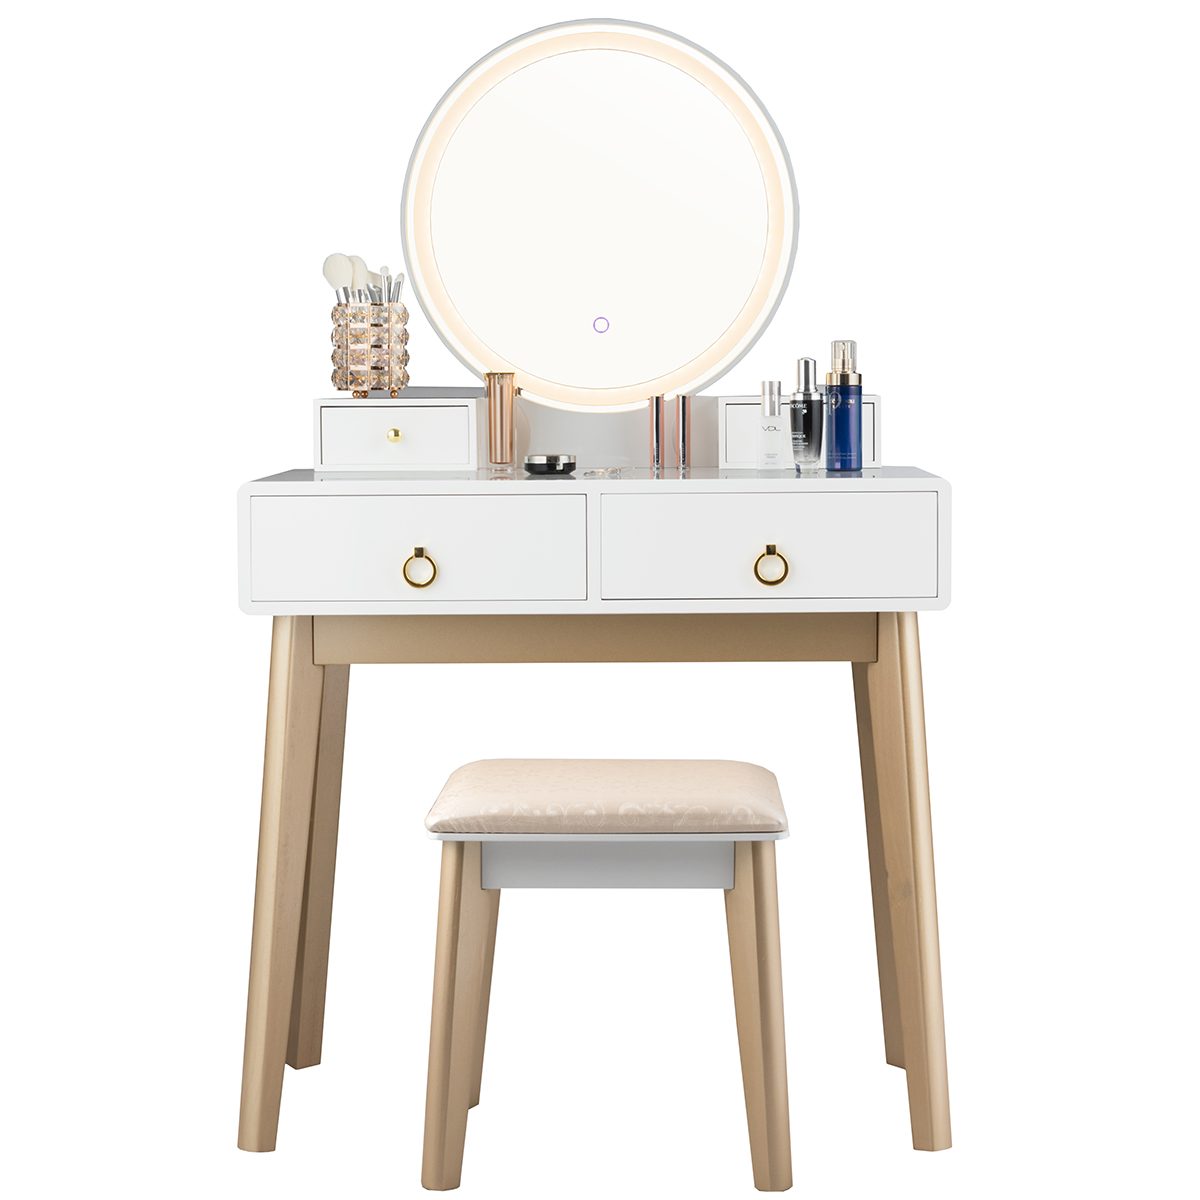 Giantex Vanity Table Set 3 Color Led Light Touch Screen Mirror W Stool Walmart Com Walmart Com